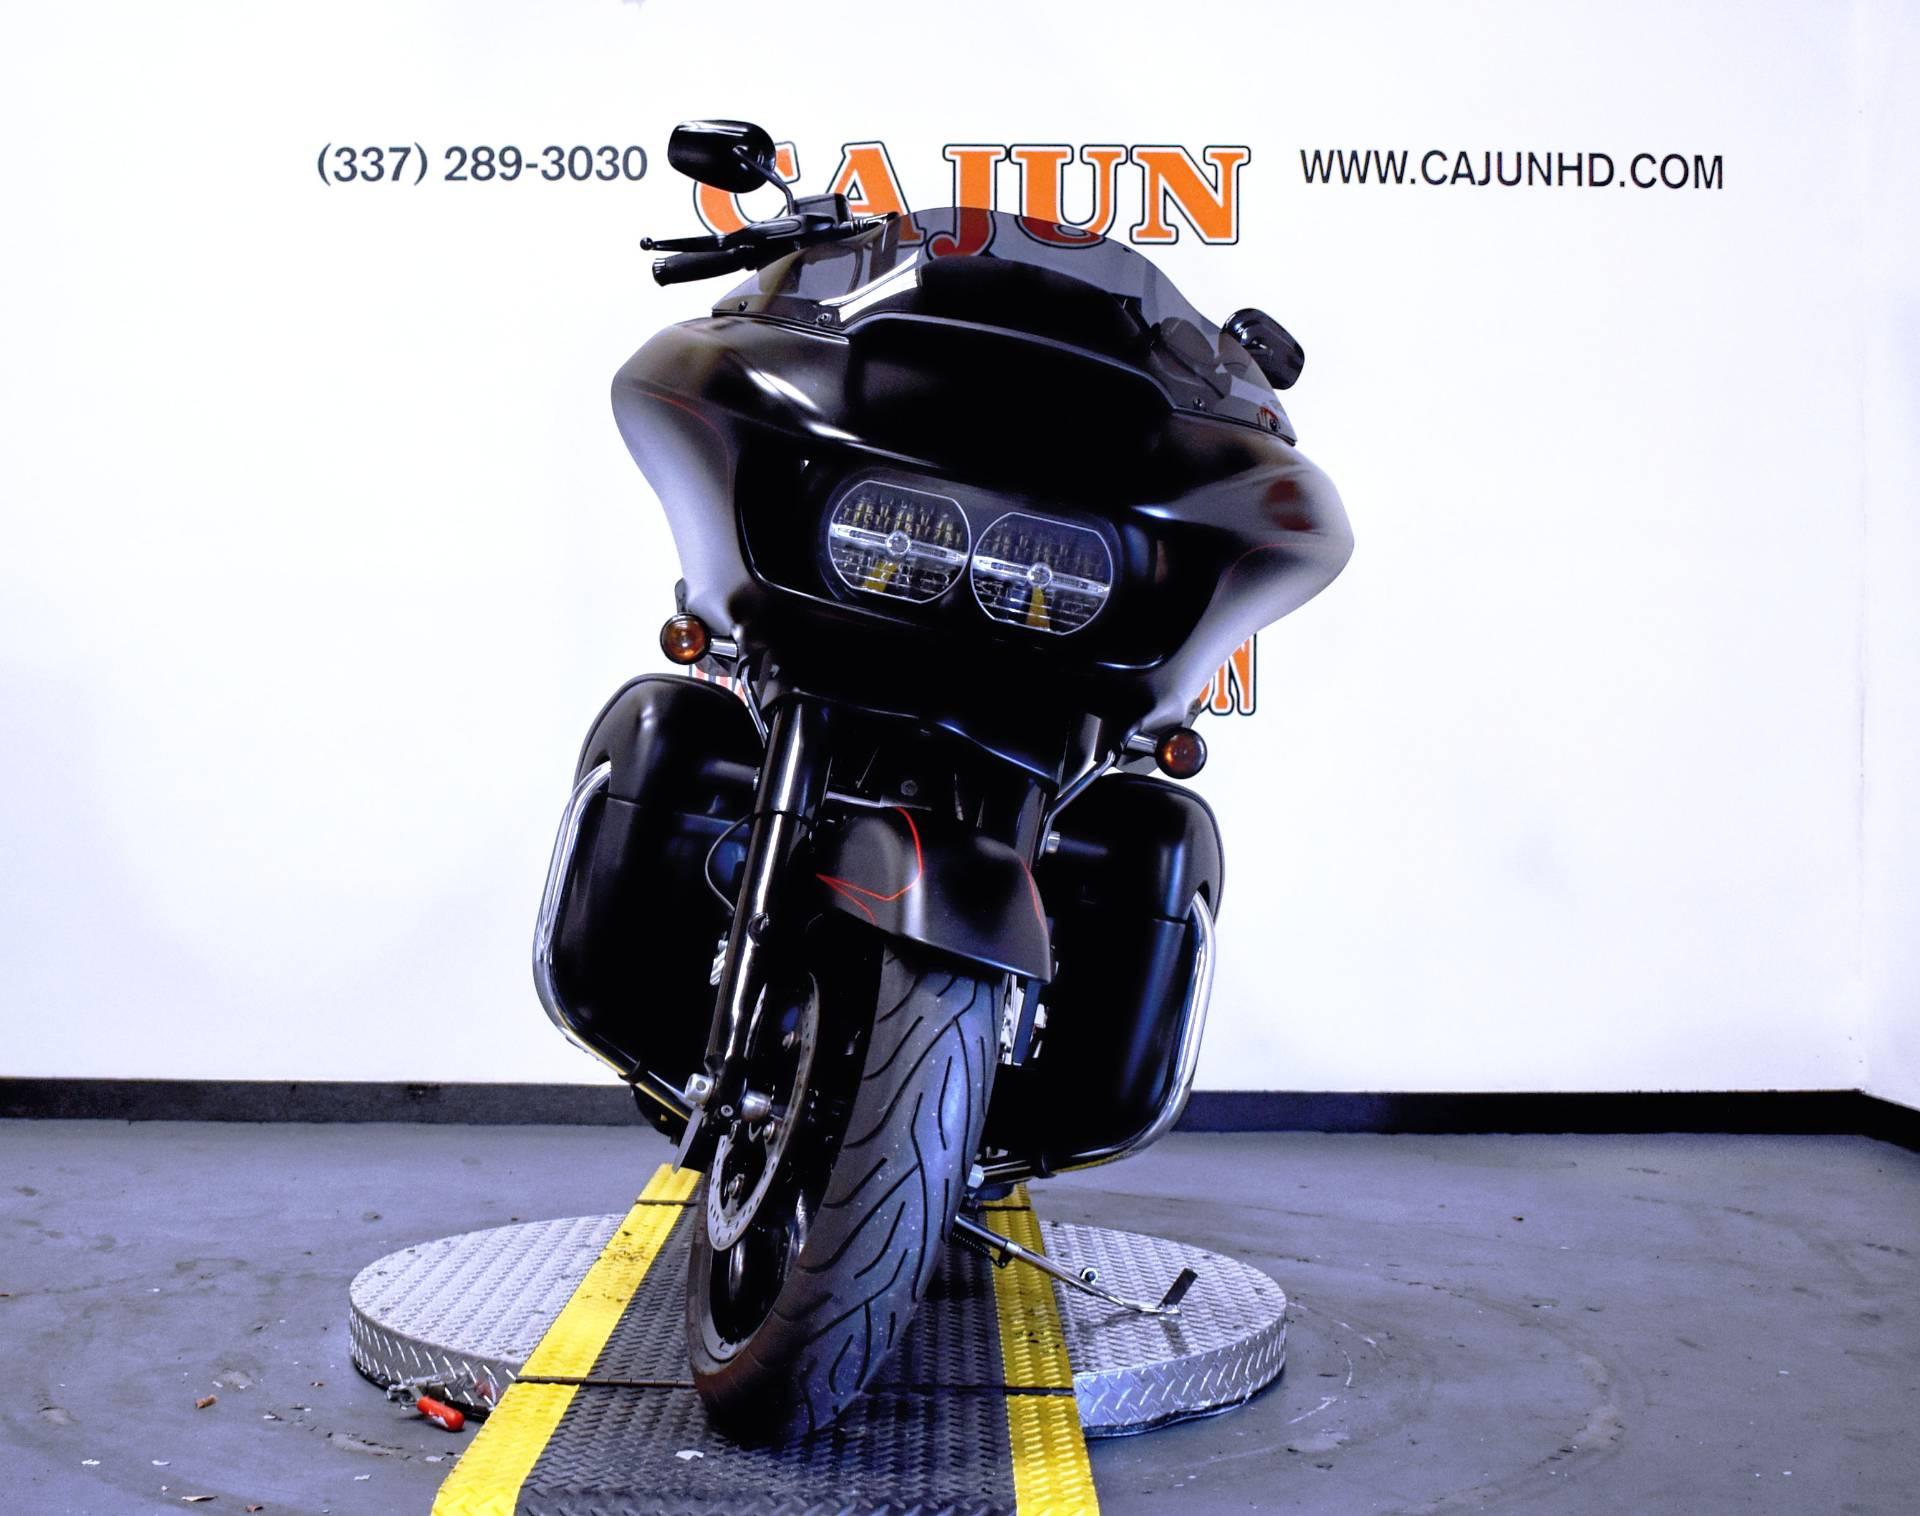 2015 Harley-Davidson Road Glide® Special in Scott, Louisiana